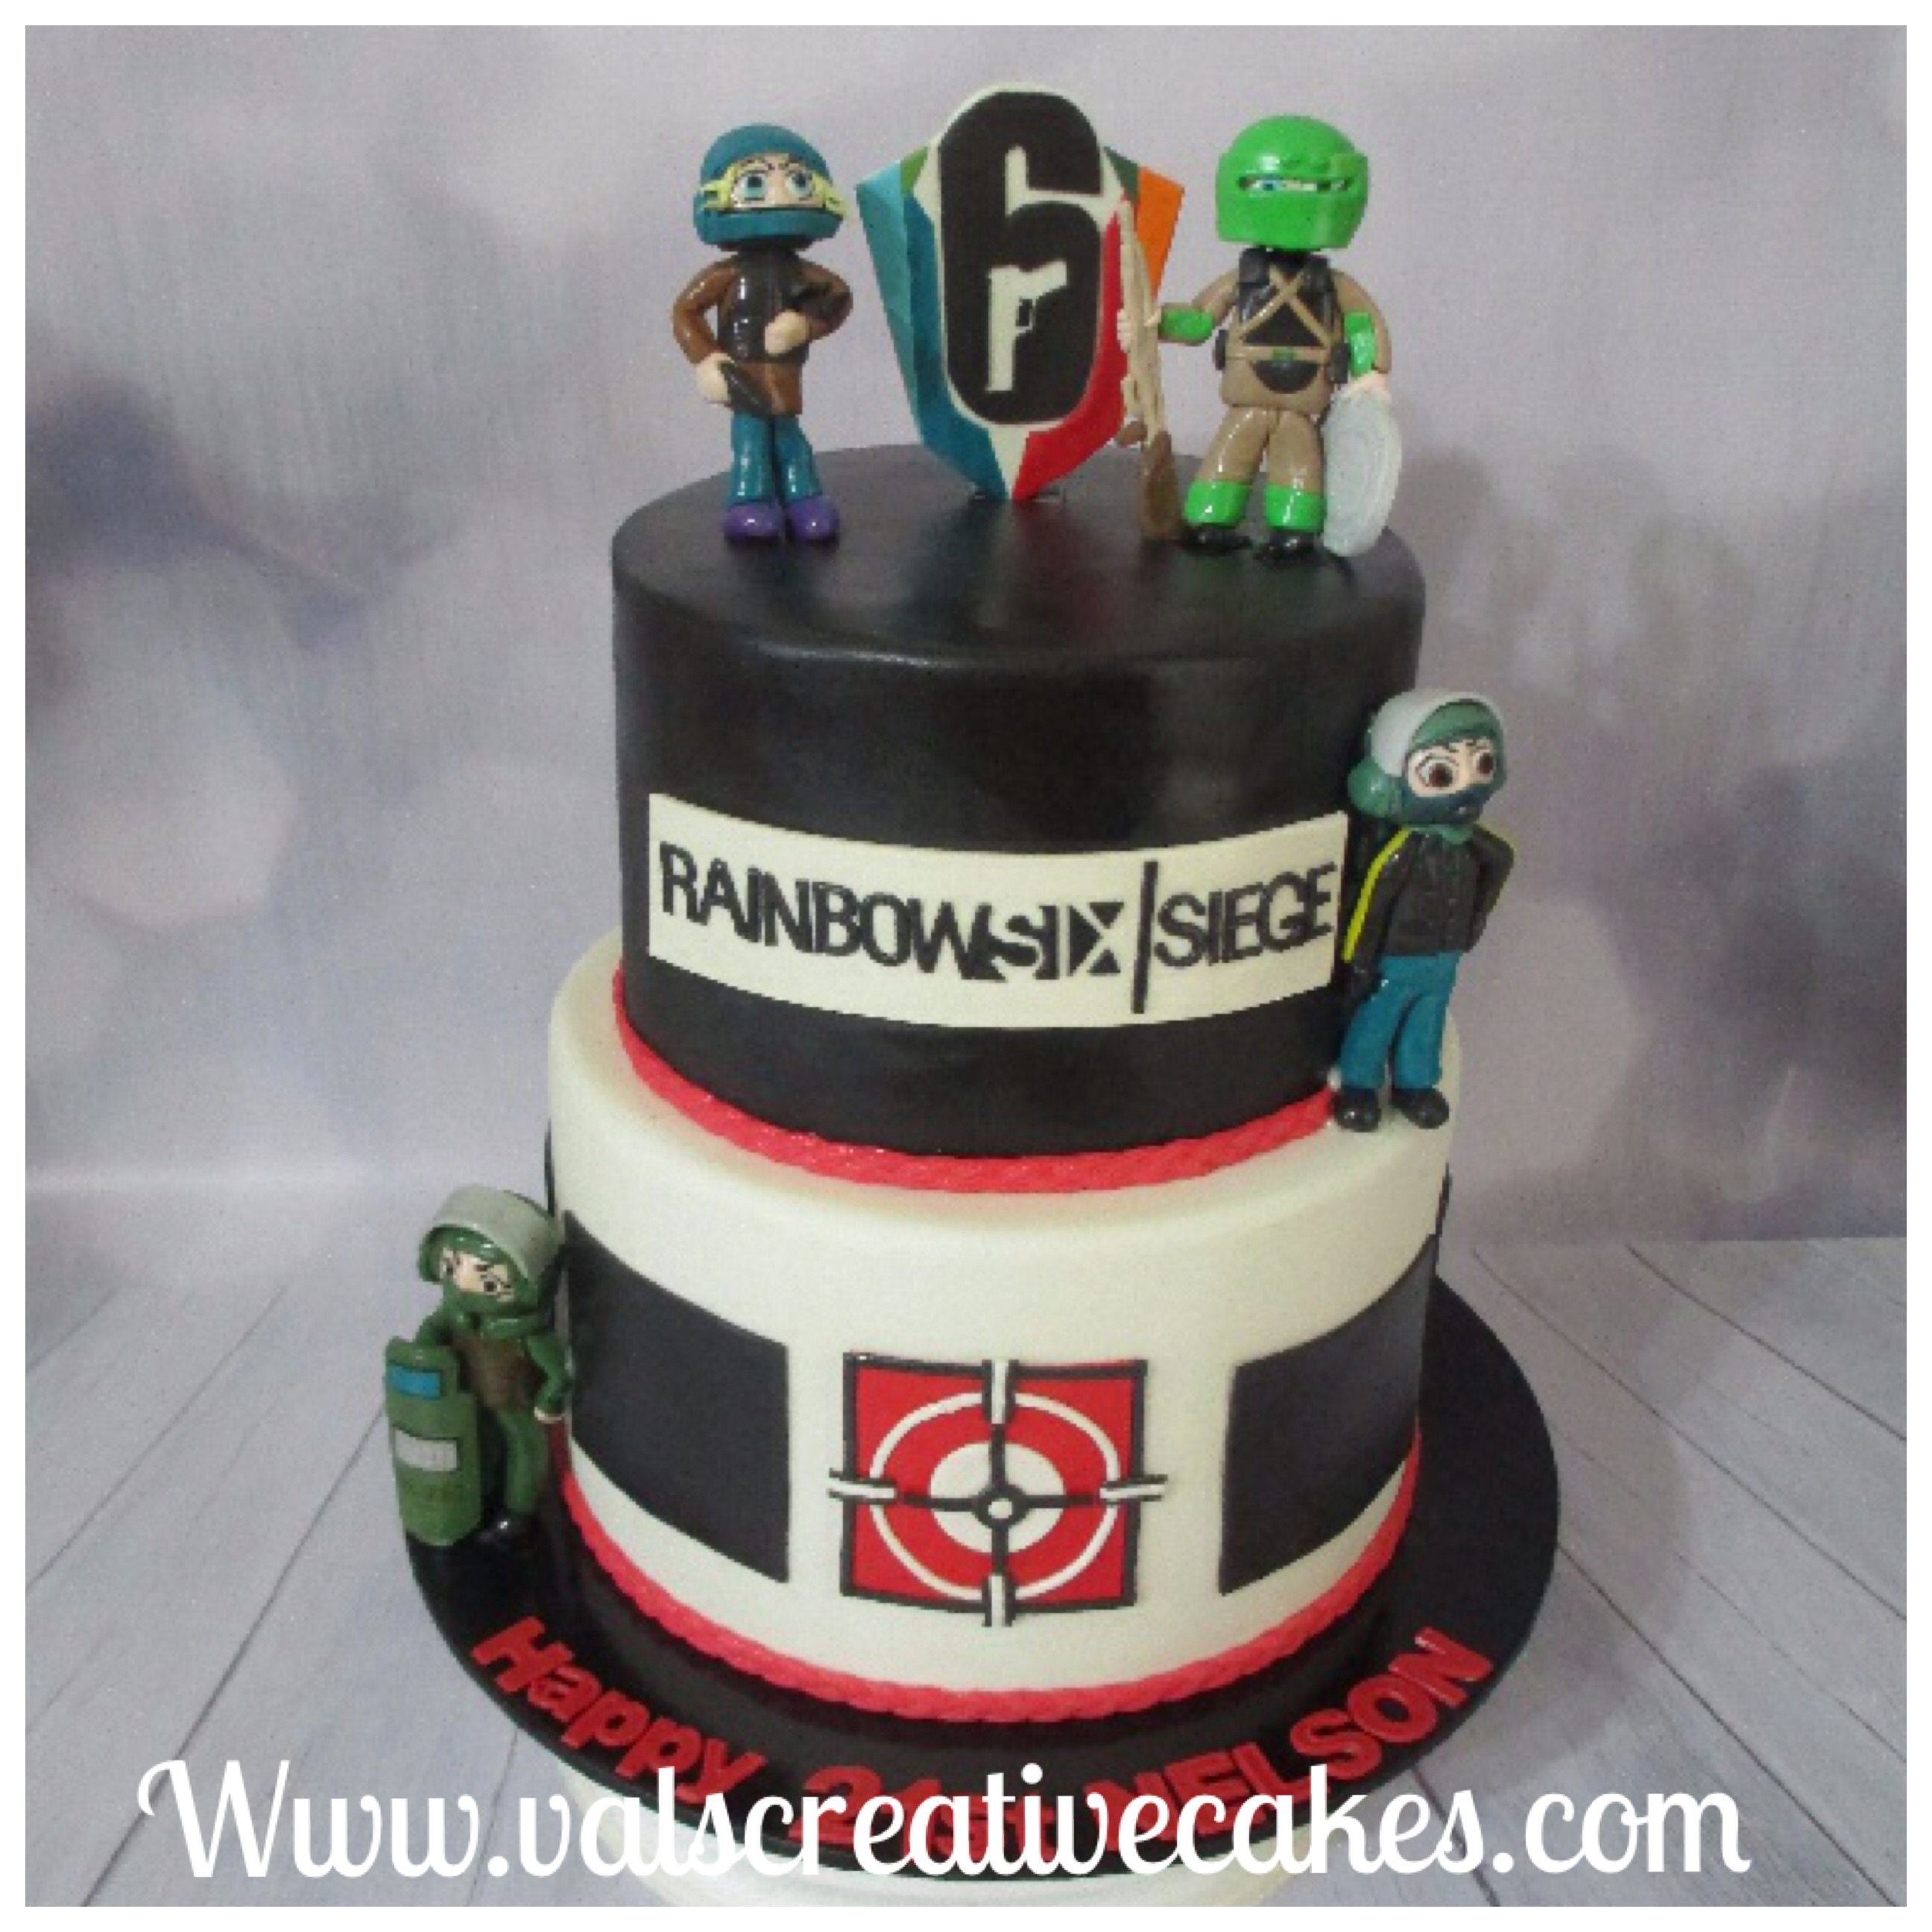 Rainbow six siege birthday cake Birthday cake gallery